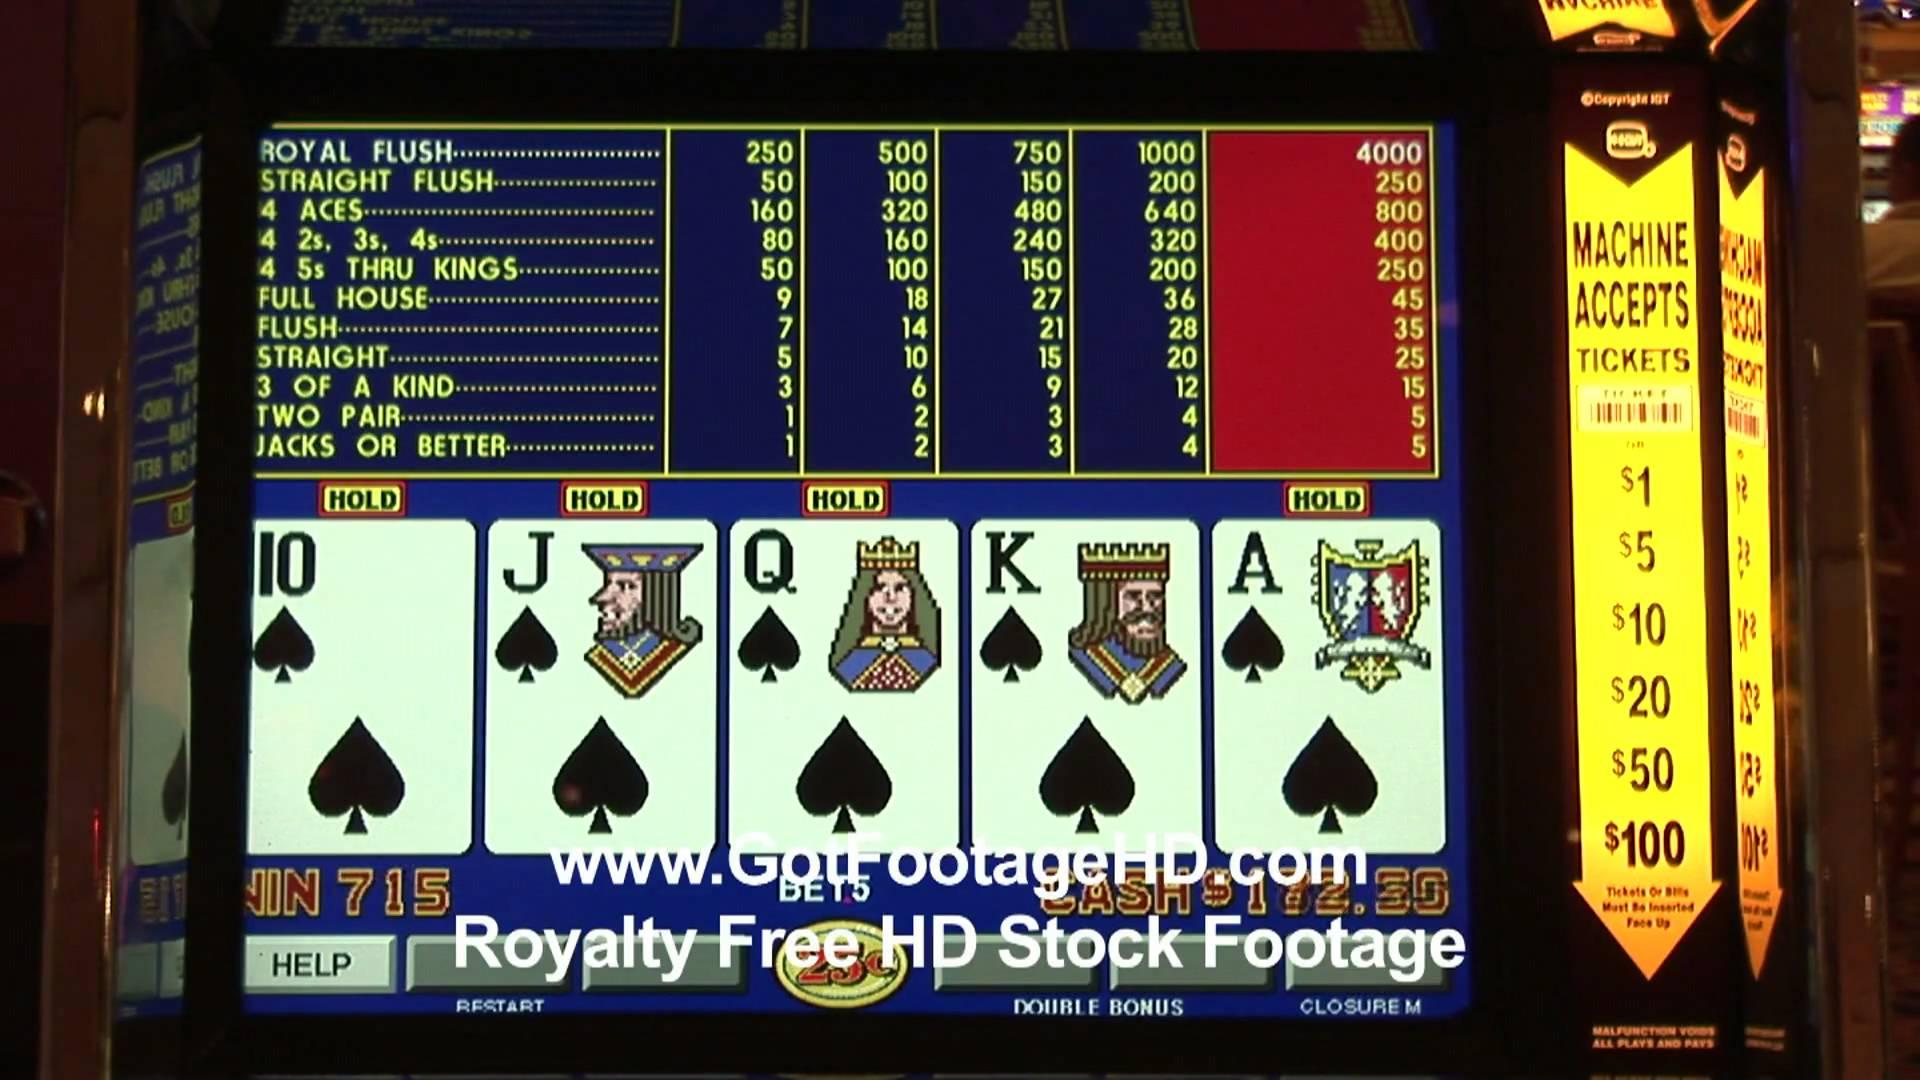 Sequentail Royal Flush on a Video Poker Machine in Las Vegas bu ...